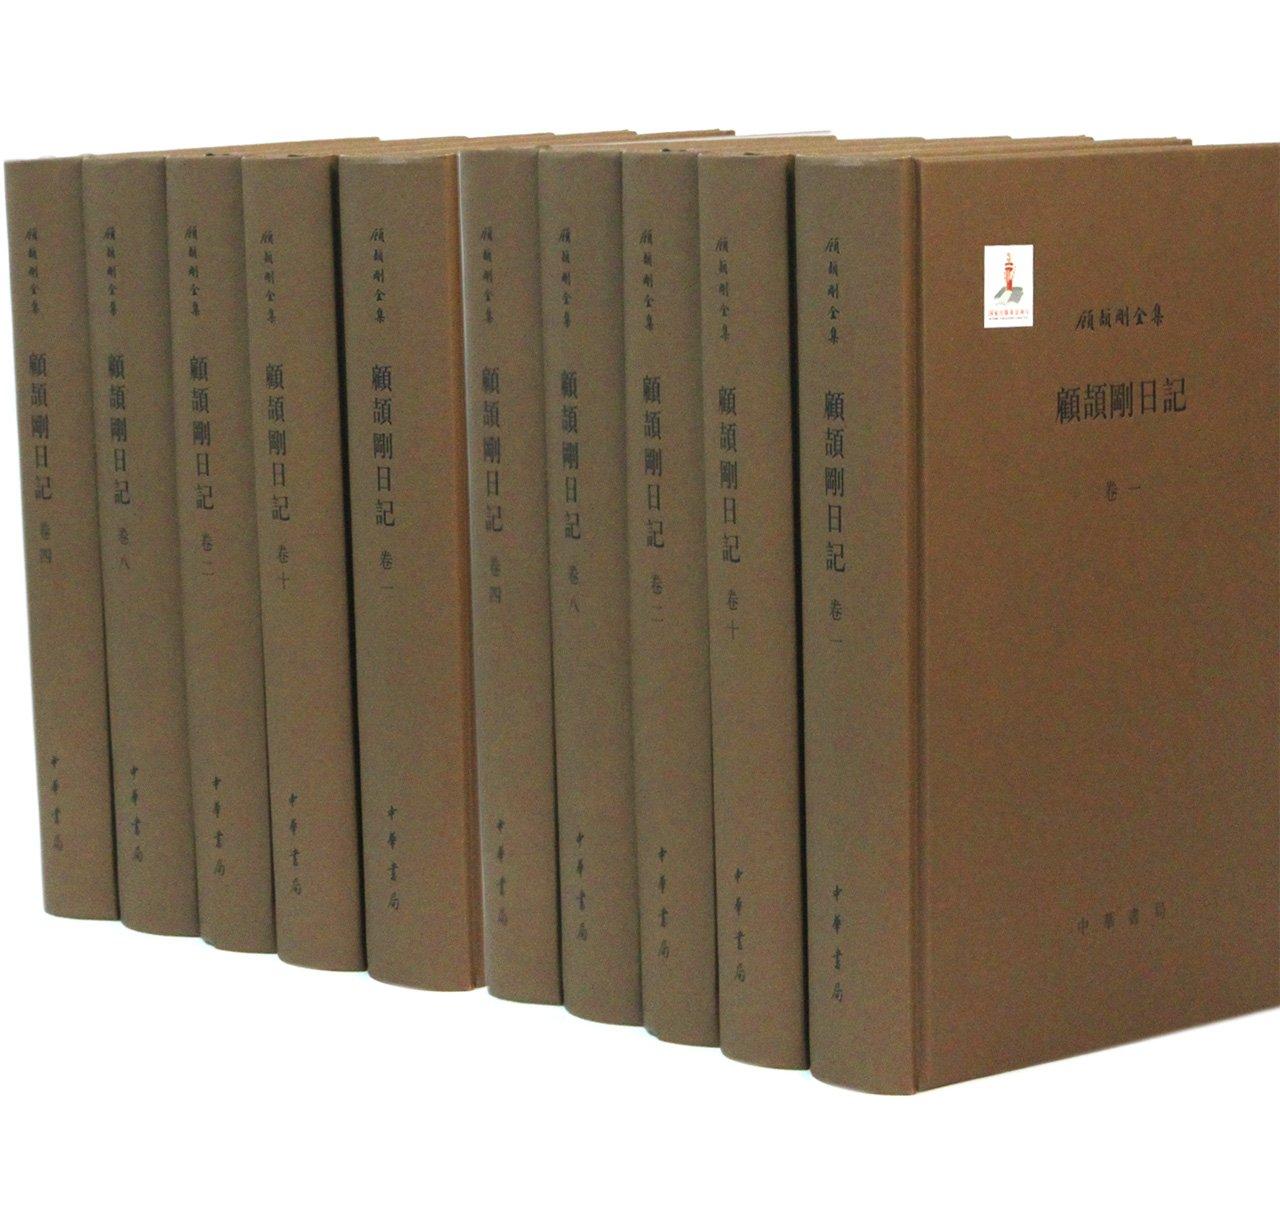 Download Diary of Gu Jiegang 12 volumes Hard paper (Chinese Edition) ebook